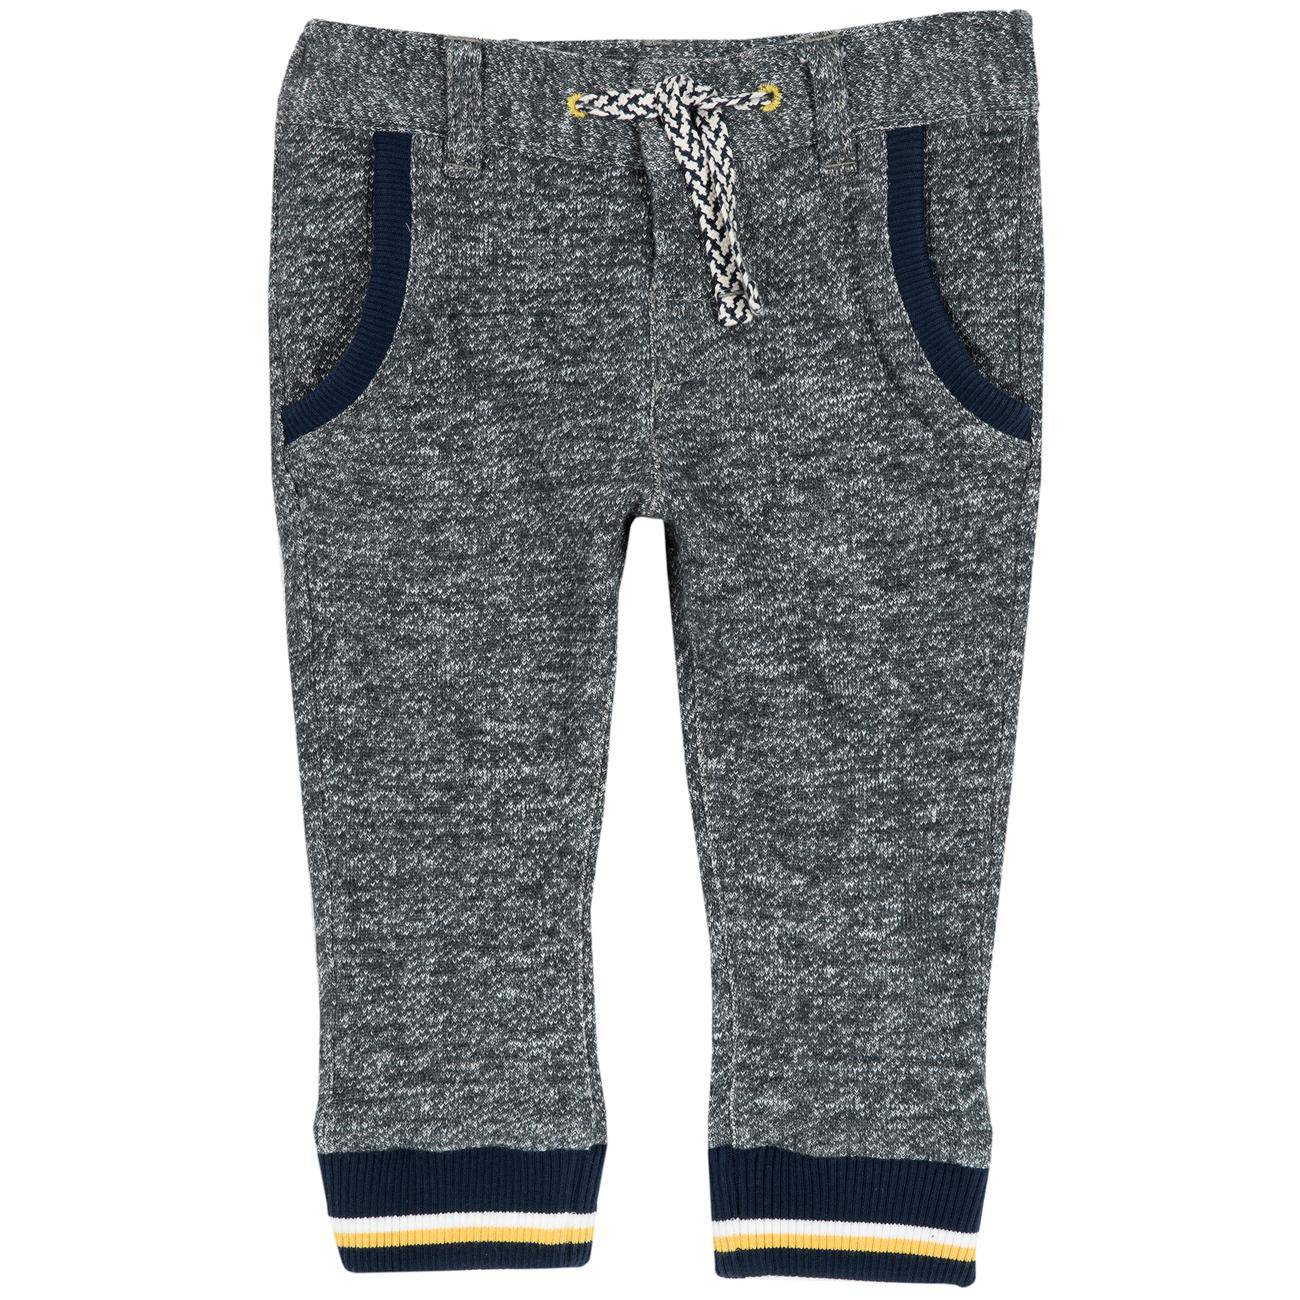 Pantalon copii Chicco, gri